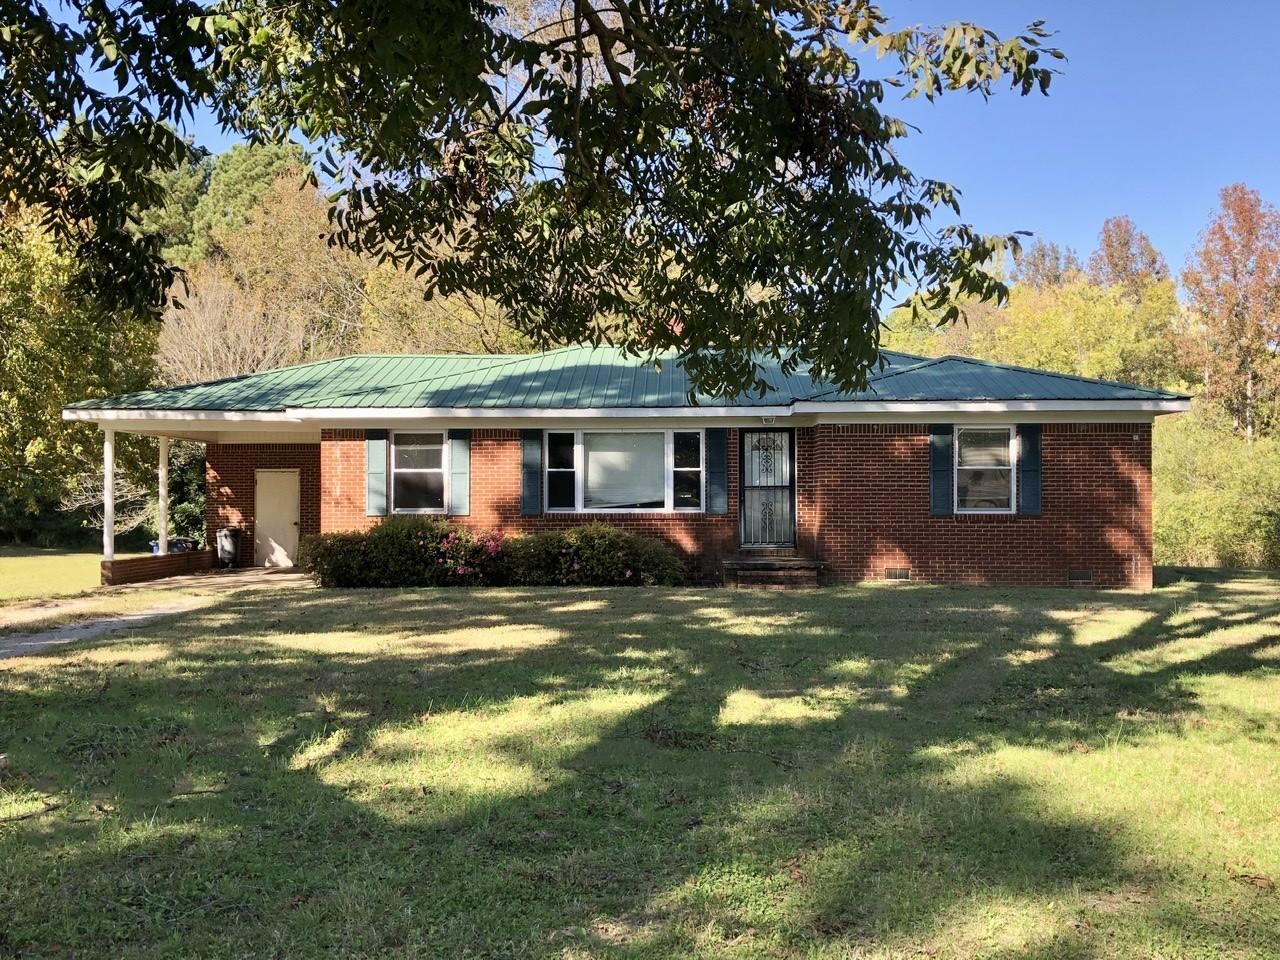 552 Farber Dr, Adamsville, TN 38310 - Adamsville, TN real estate listing